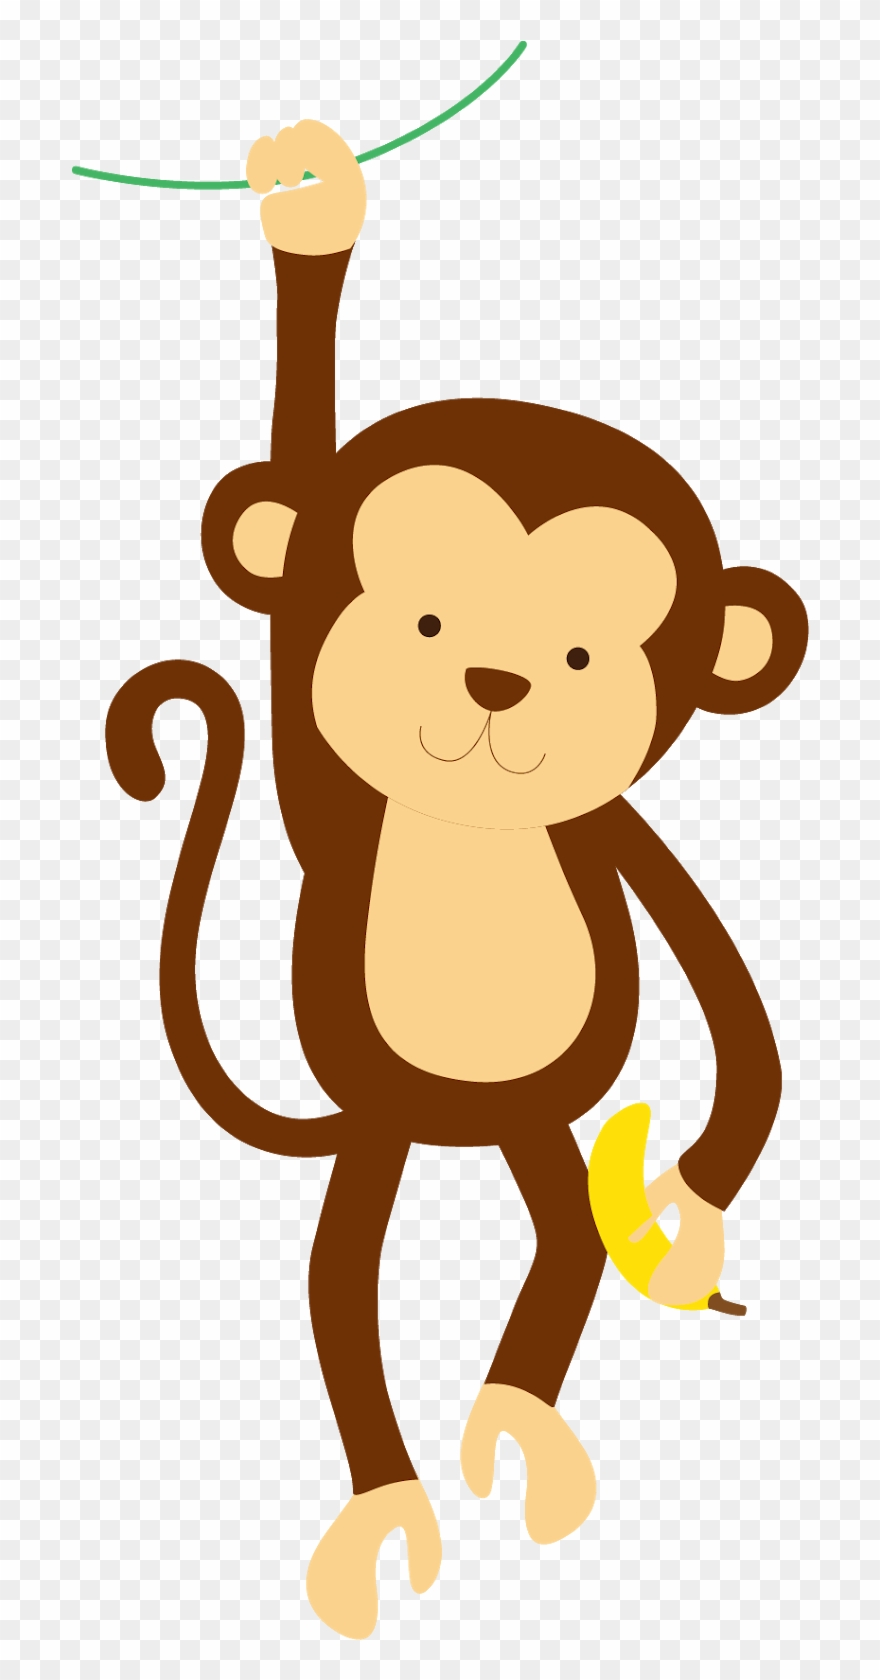 banner transparent library Chimpanzee cartoon clip art. Ape clipart primate